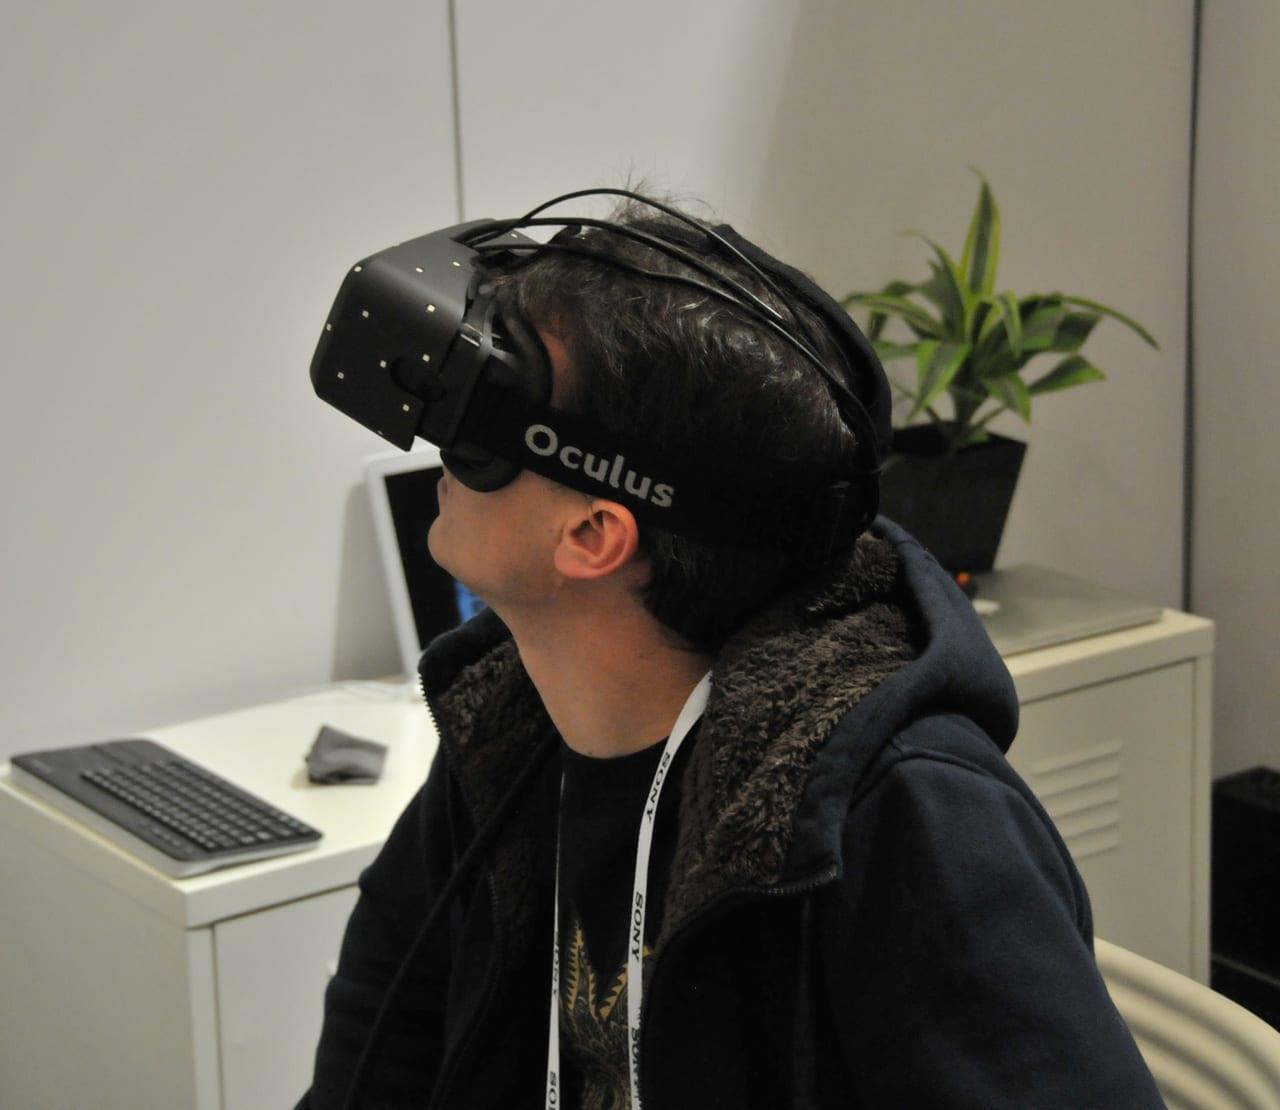 07064540-photo-oculus-rift-hd-4